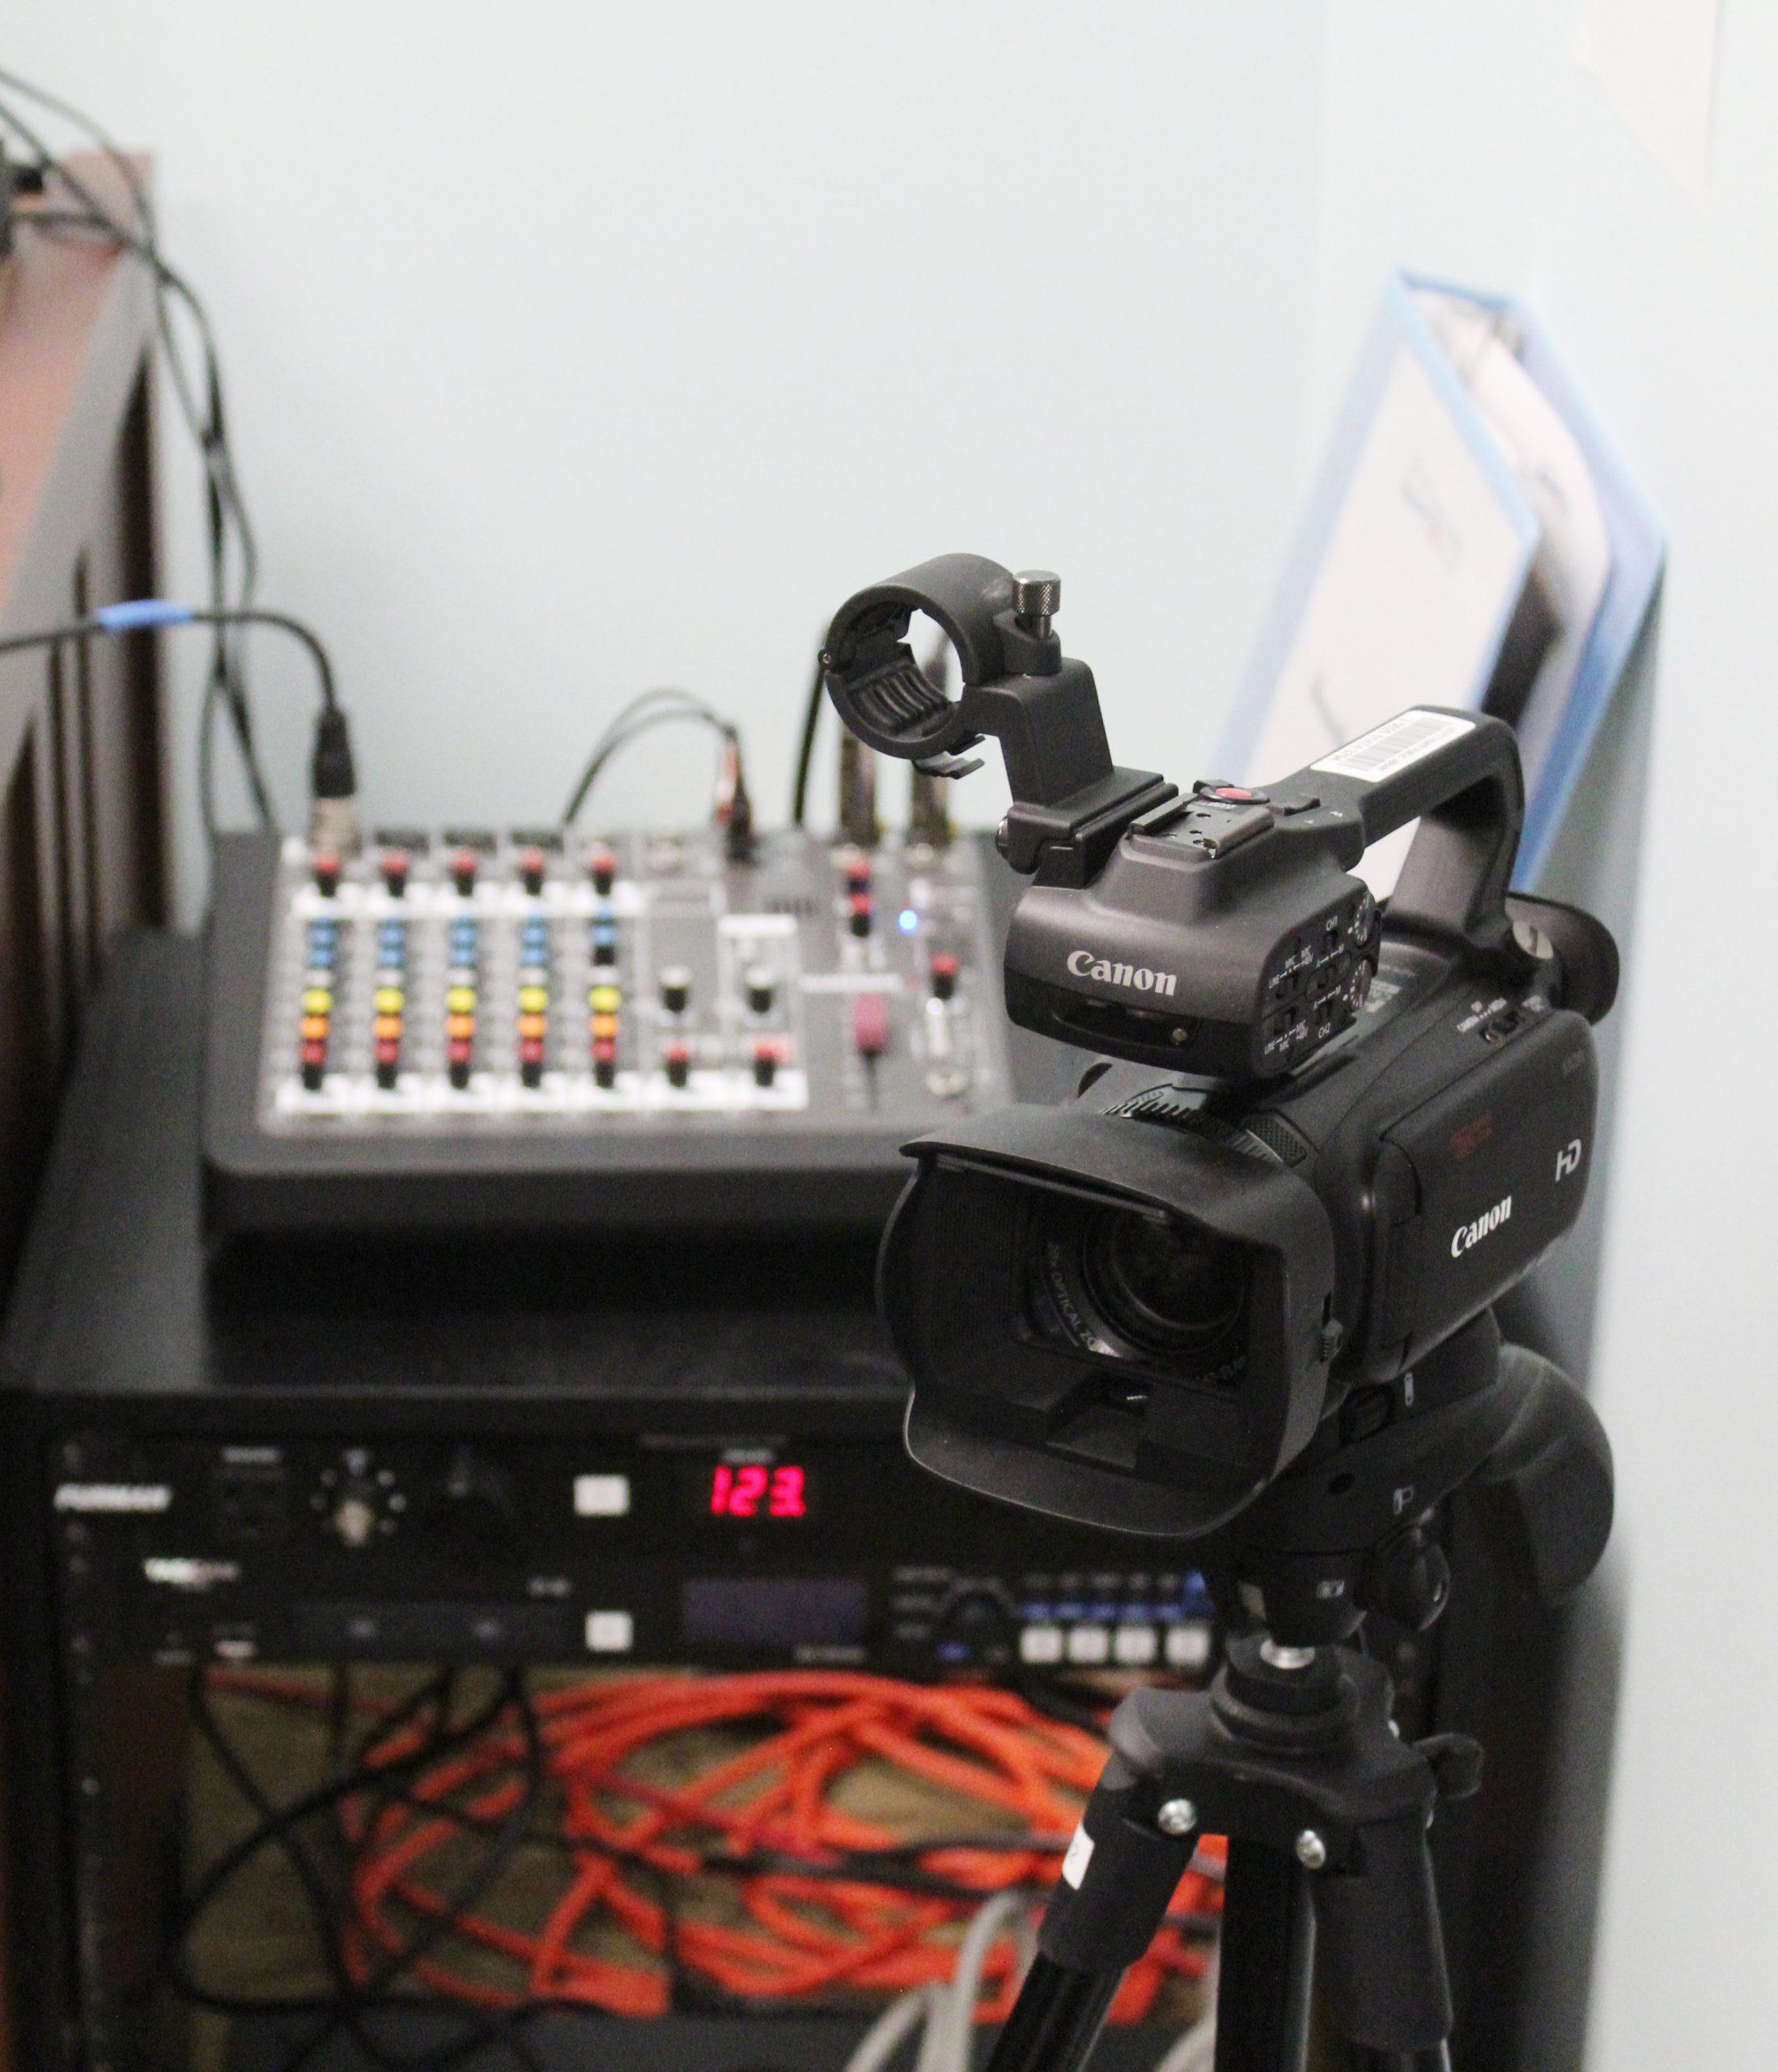 Recording studio equipment has variety of equipment